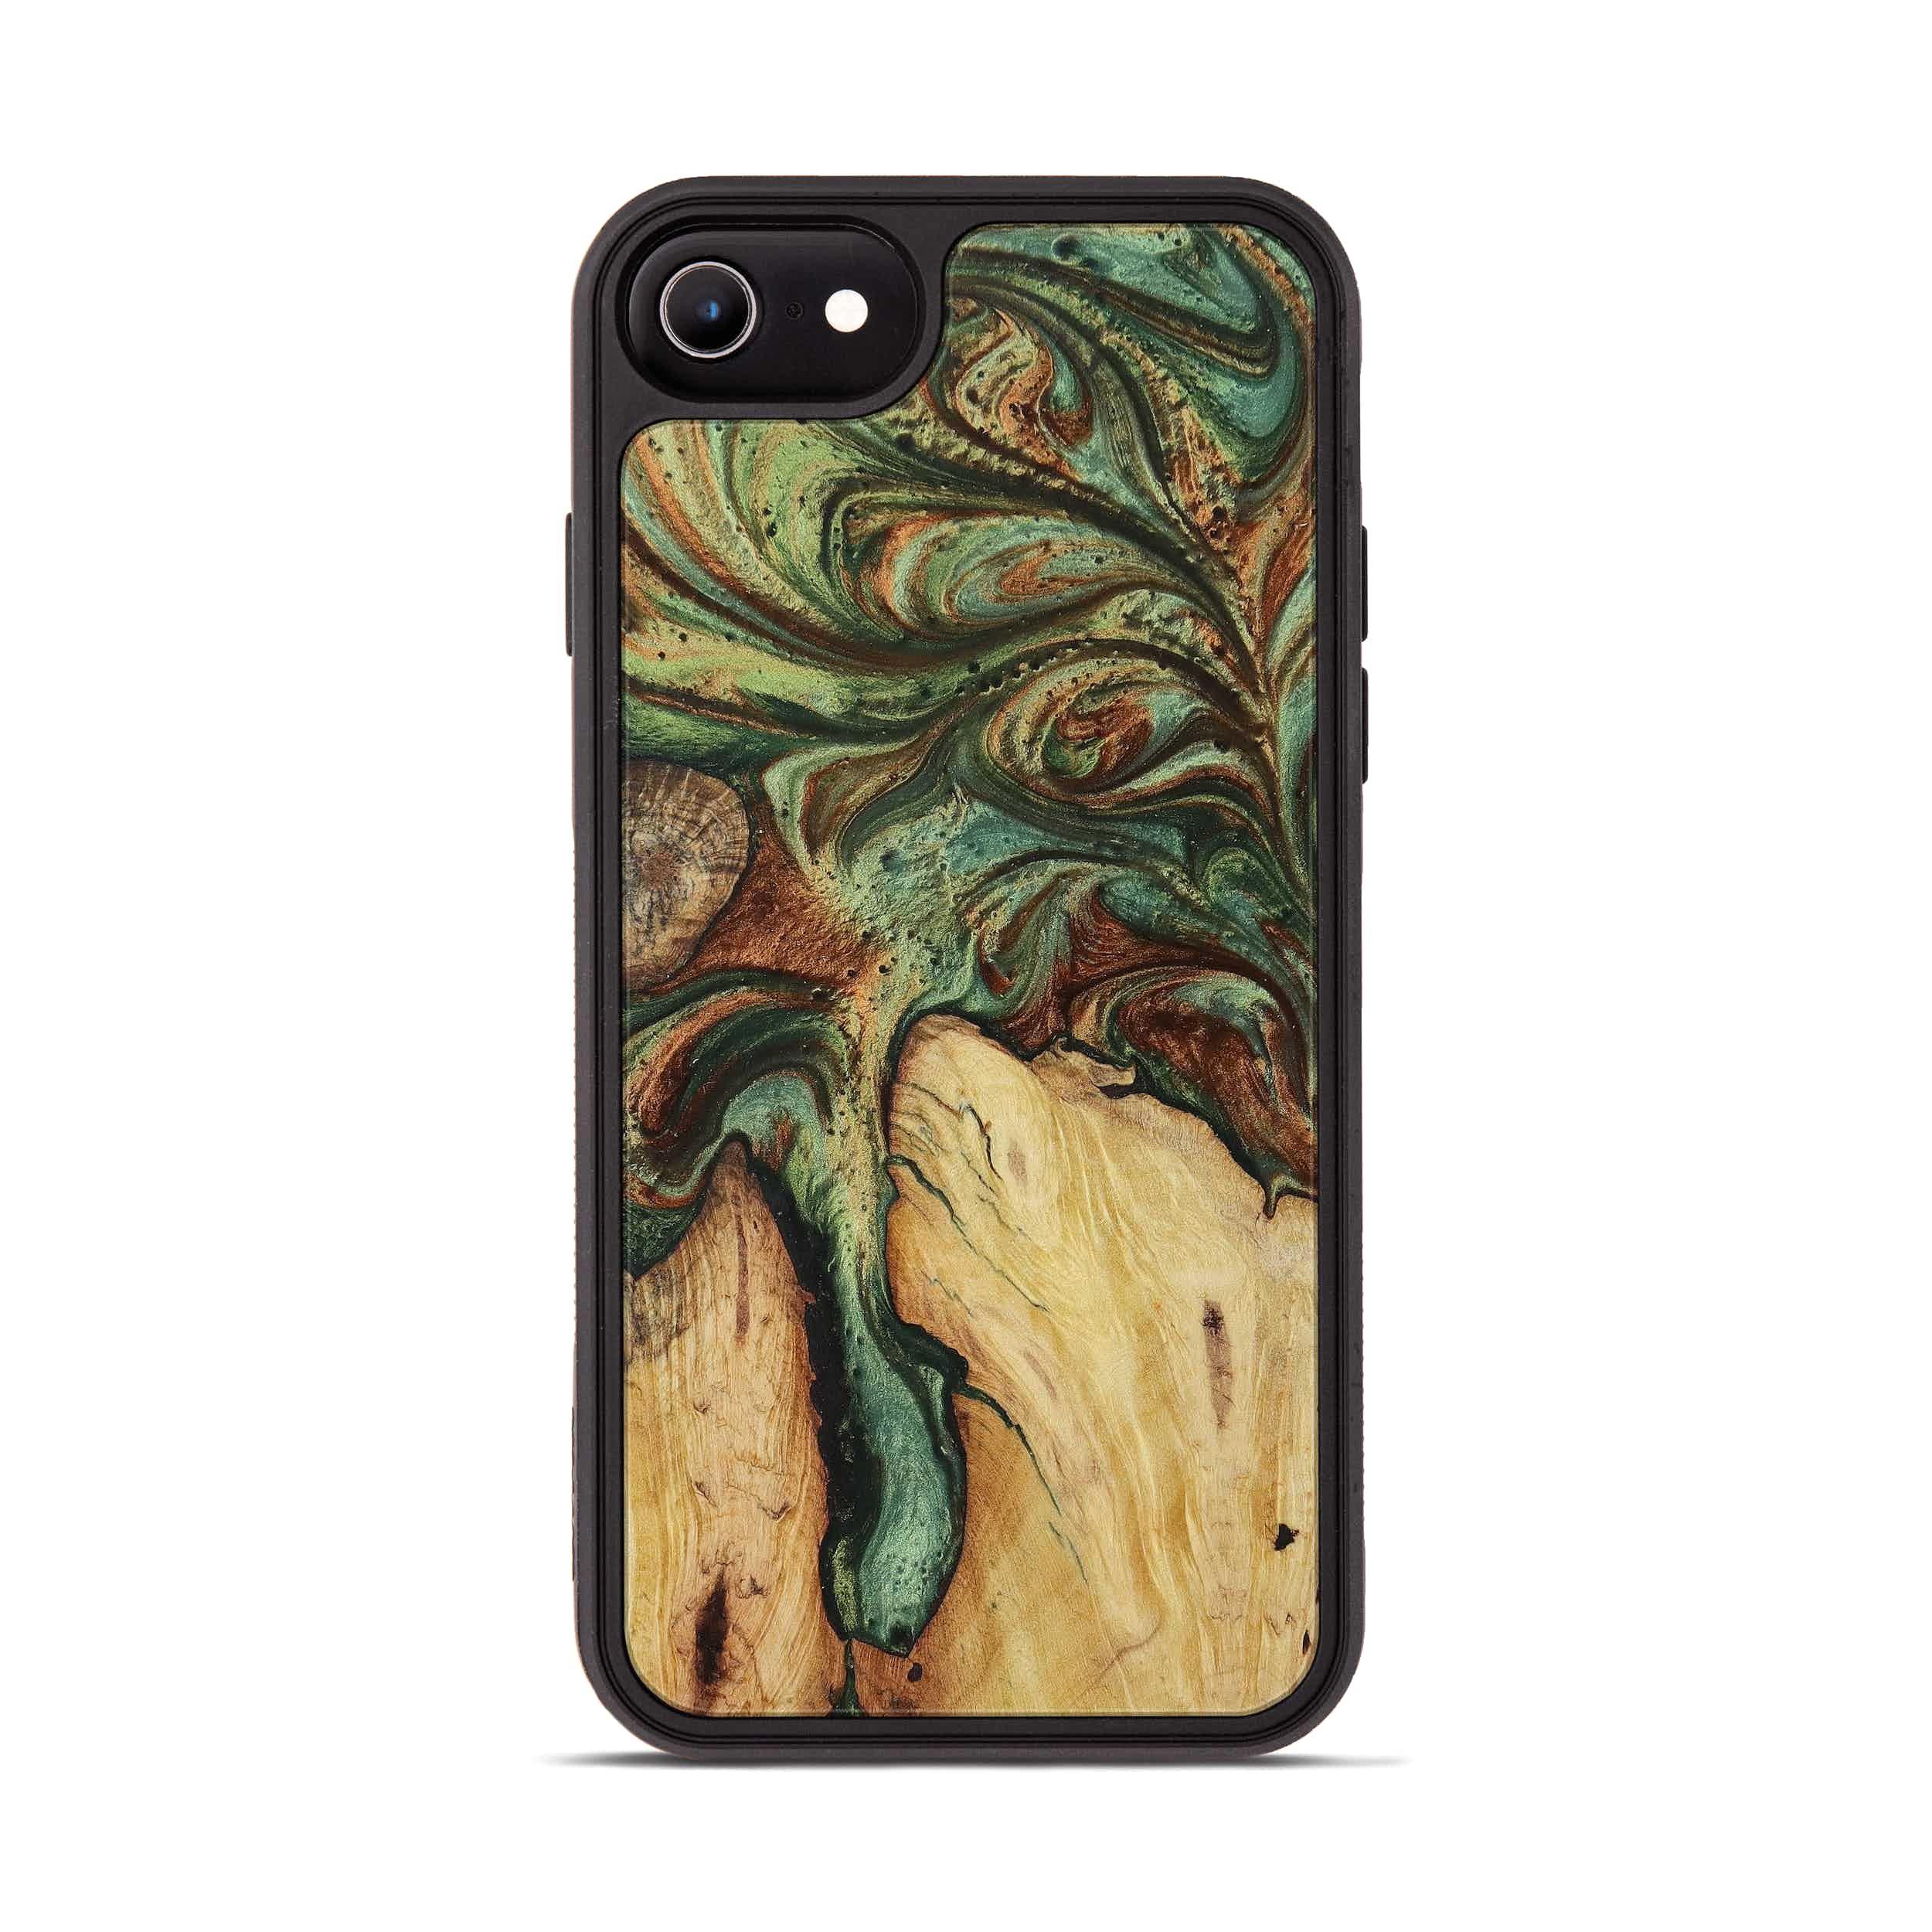 iPhone 6s Wood+Resin Phone Case - Charmain (Dark Green, 397861)